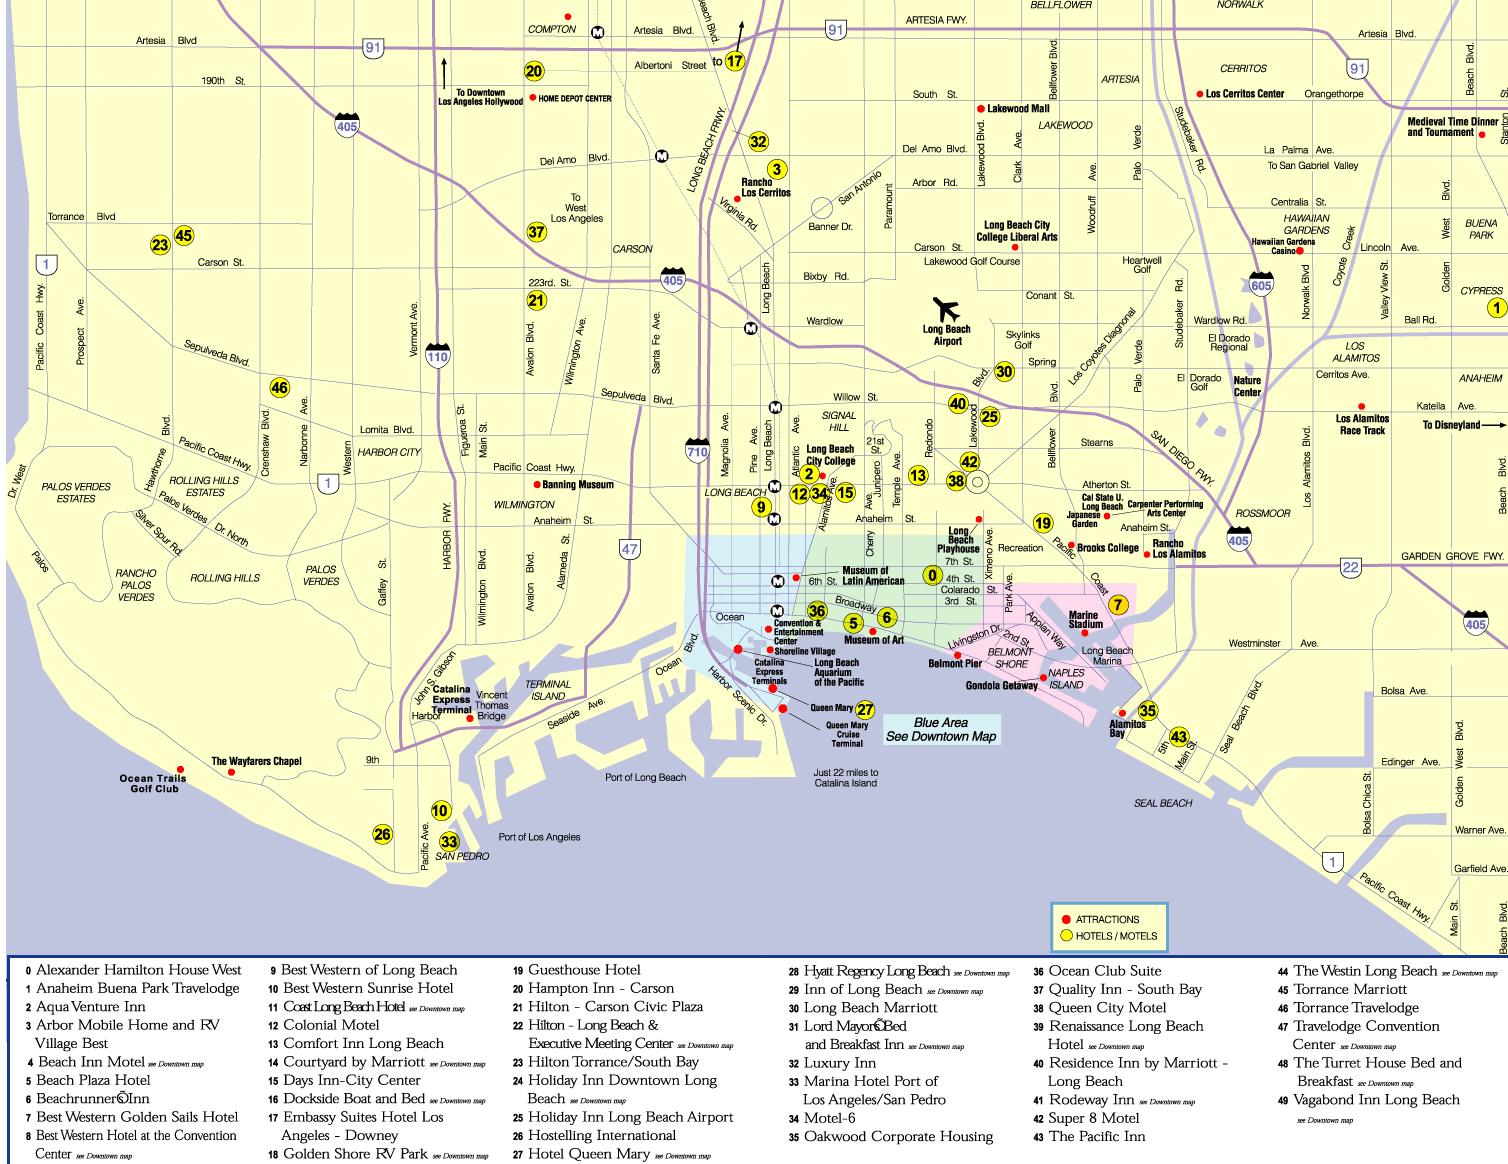 Long Beach California City Google Maps California Long Beach - Map Of Long Beach California And Surrounding Areas